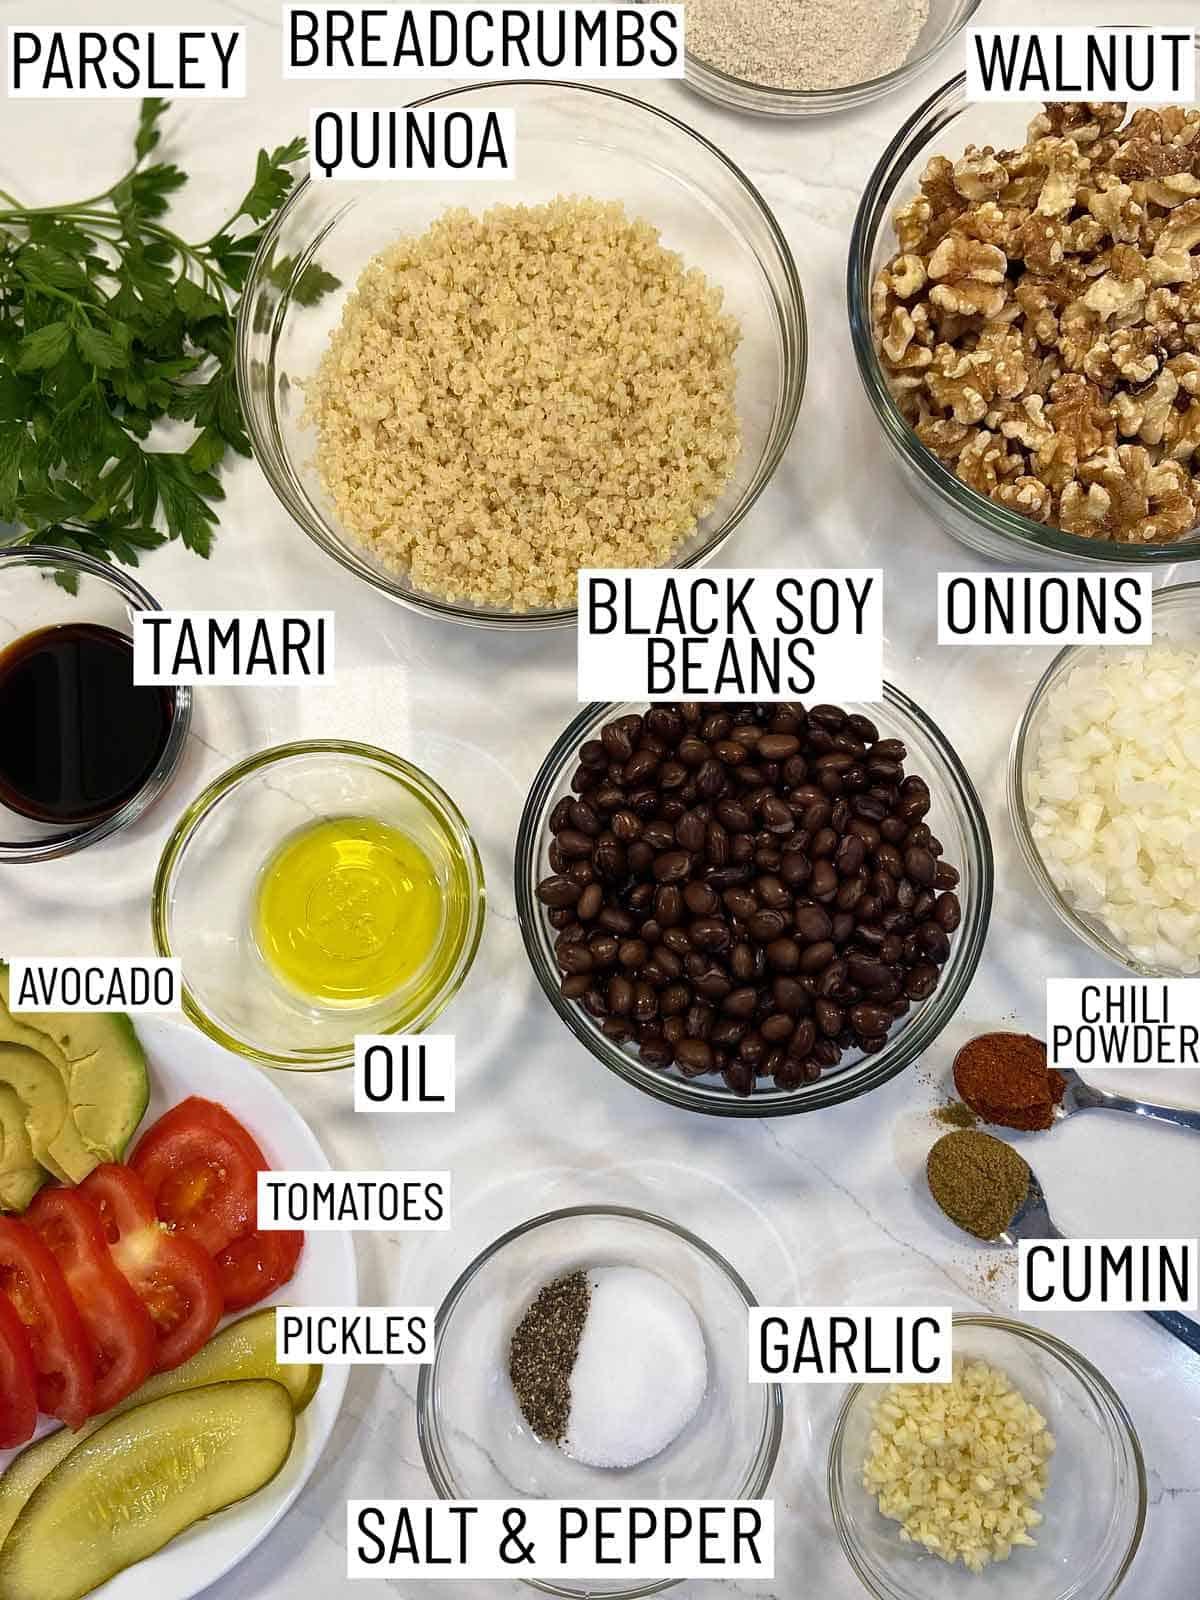 Ingredients needed to make quinoa burgers.